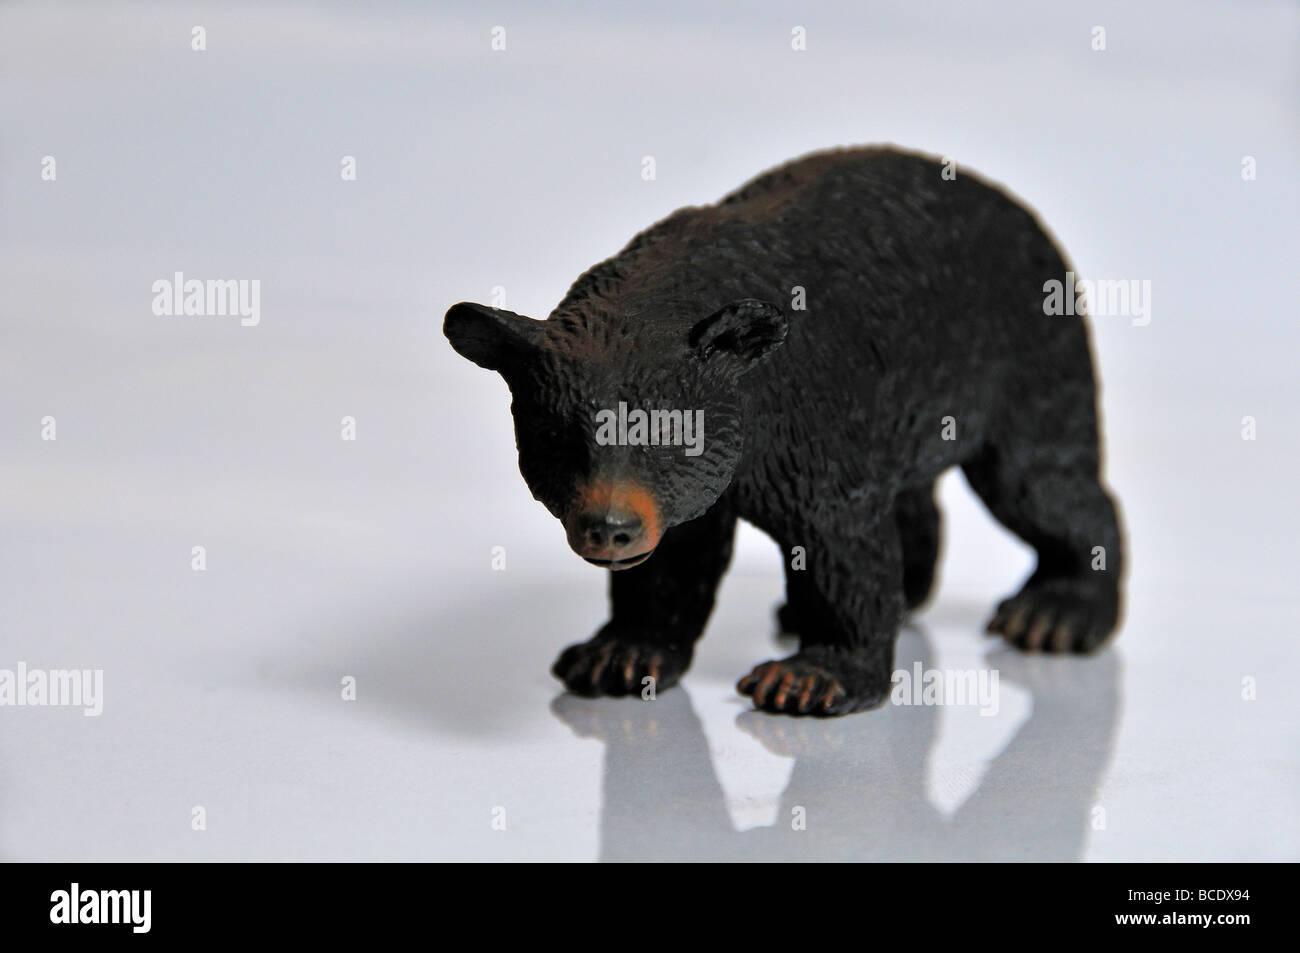 Balck bear on a reflective surface. Studio photo - Stock Image